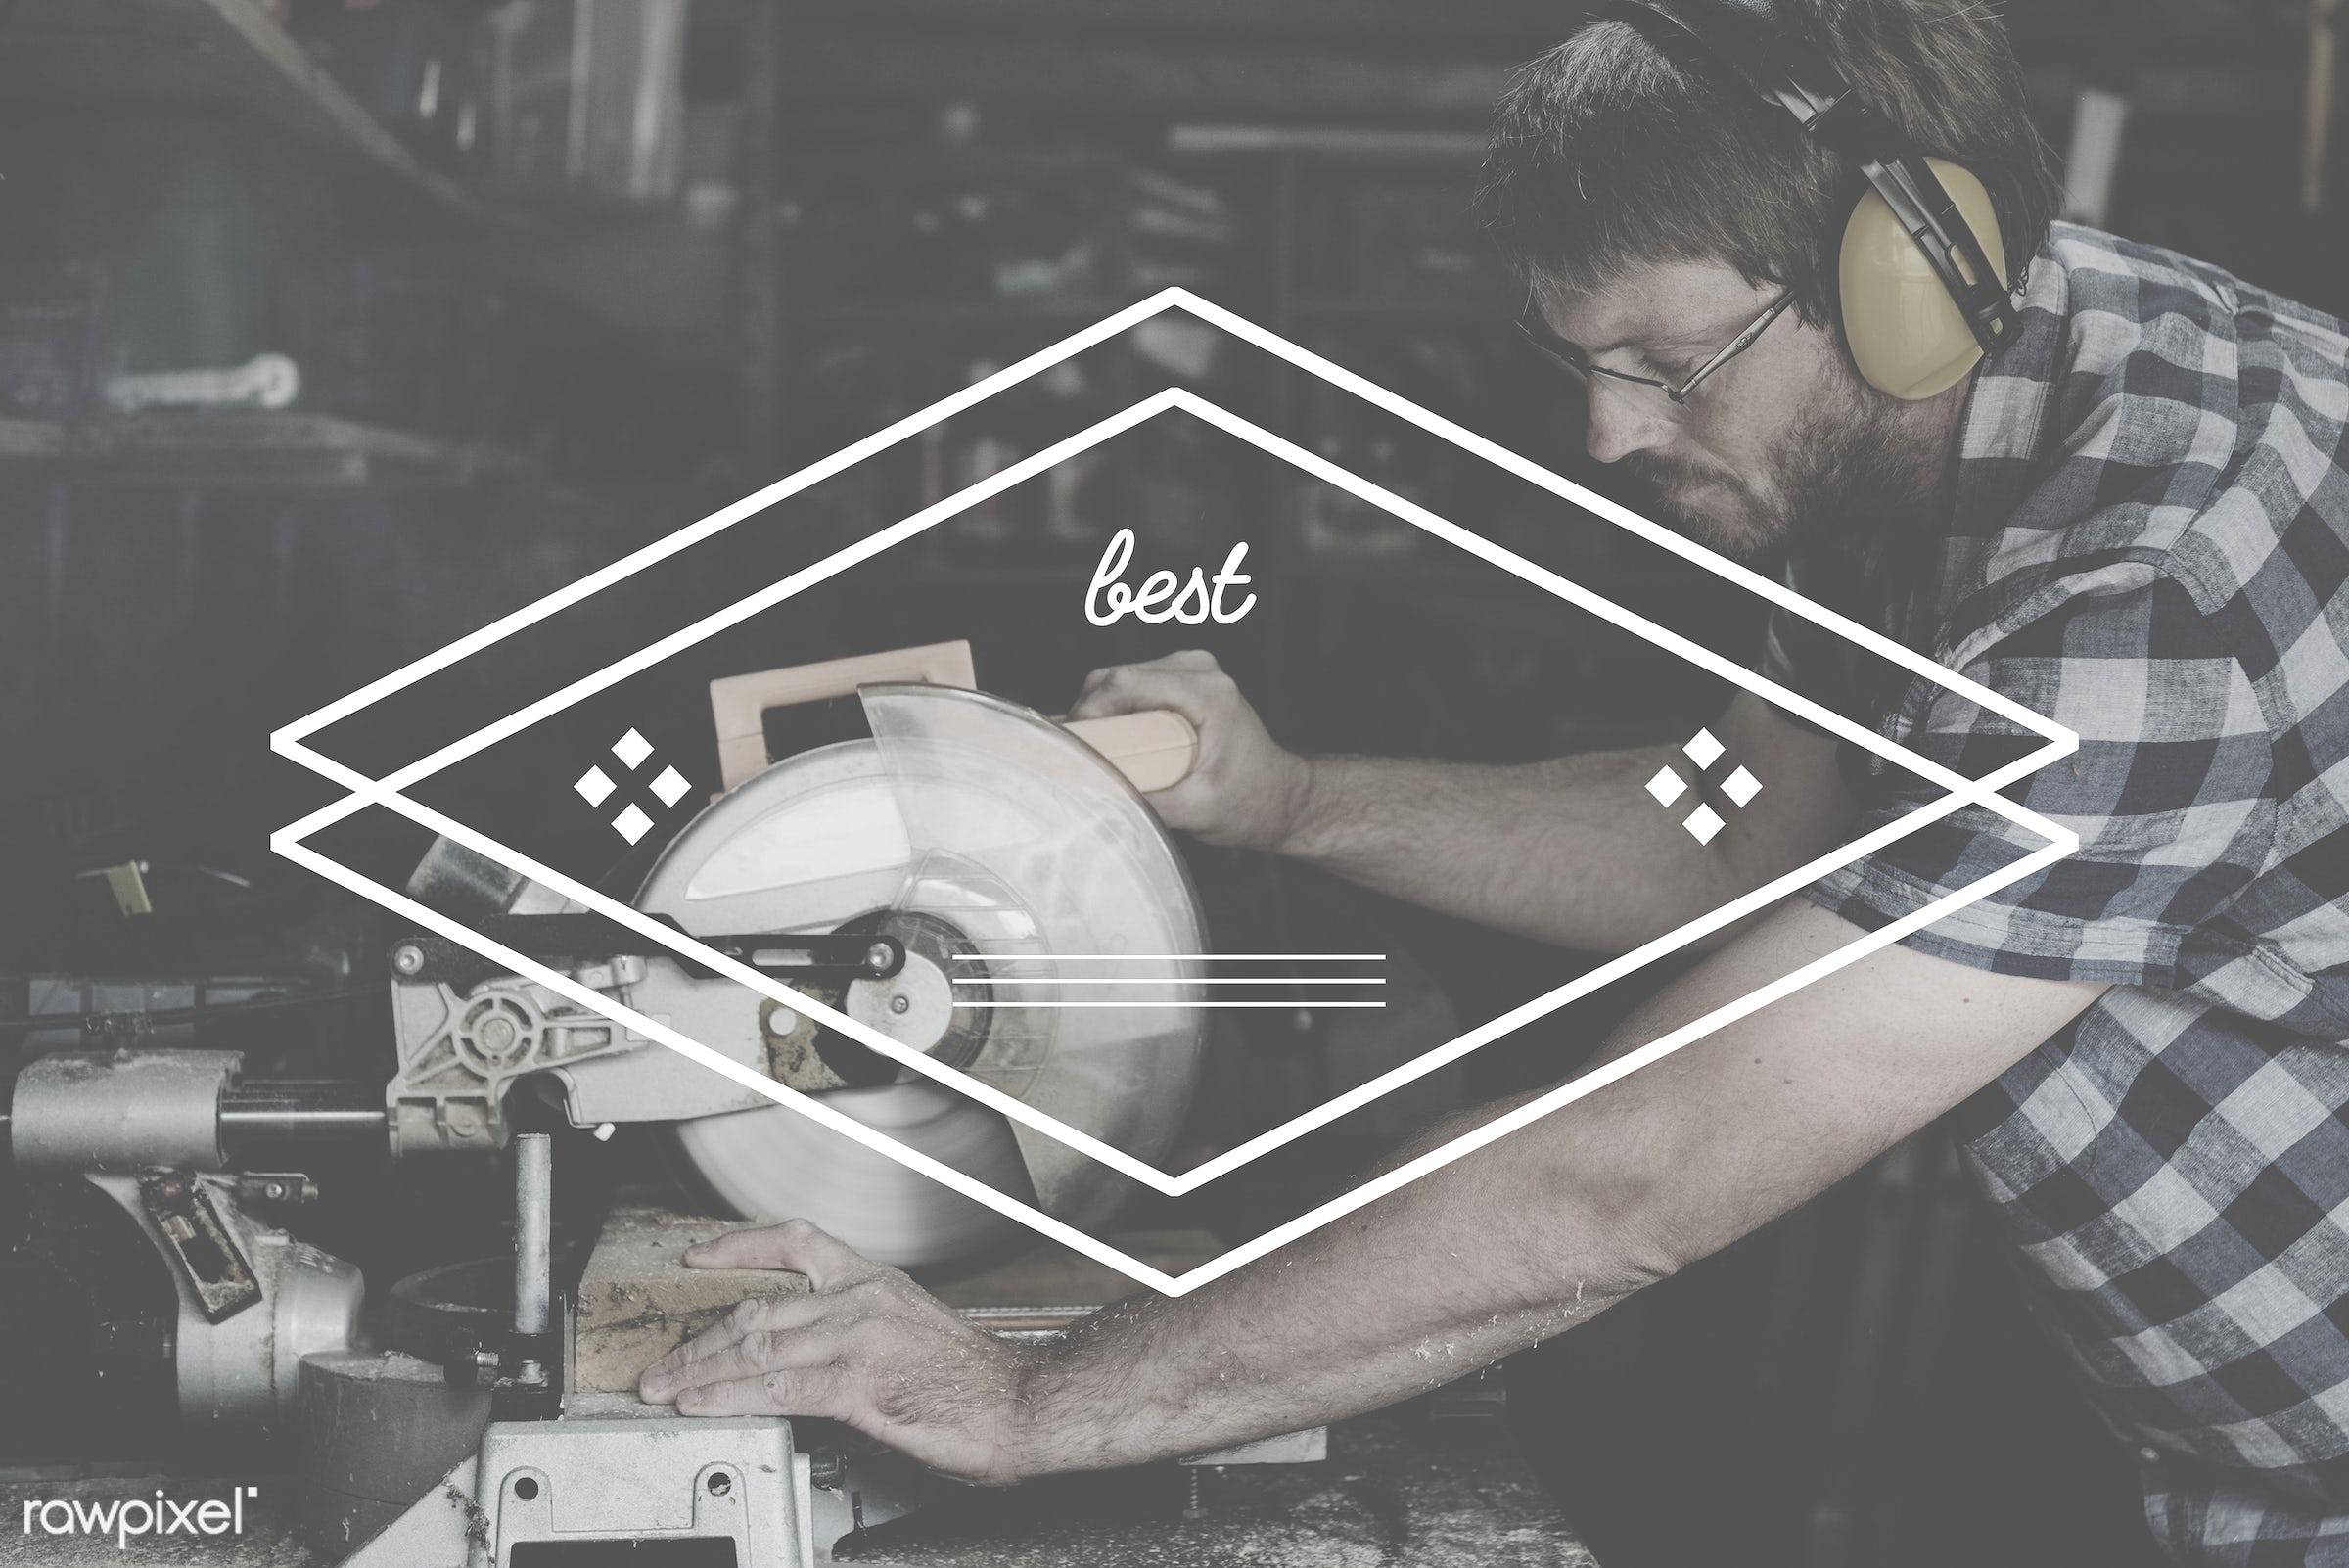 accuracy, badge, banner, best, blank, brand, branding, business, carpenter, carpentry, copy space, craft, craftsman, diamond...